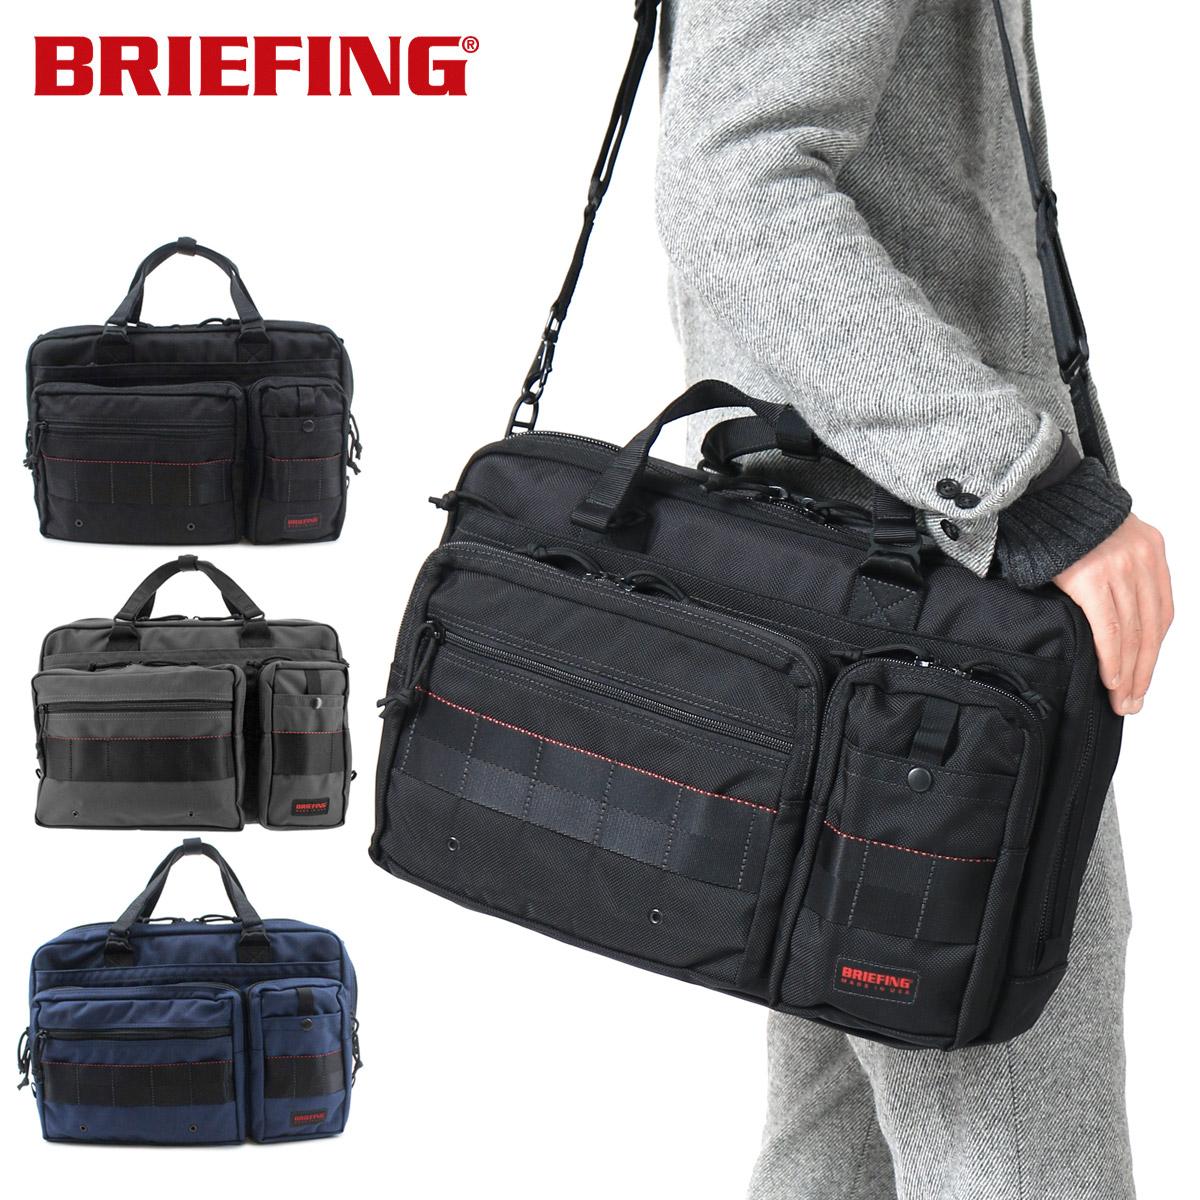 b28a0a3c61cb ブリーフィング ショルダーバッグ 2WAY メンズ USA ネオライナー BRF145219 BRIEFING ビジネスバッグ キャリーオン  セットアップ ビジネス